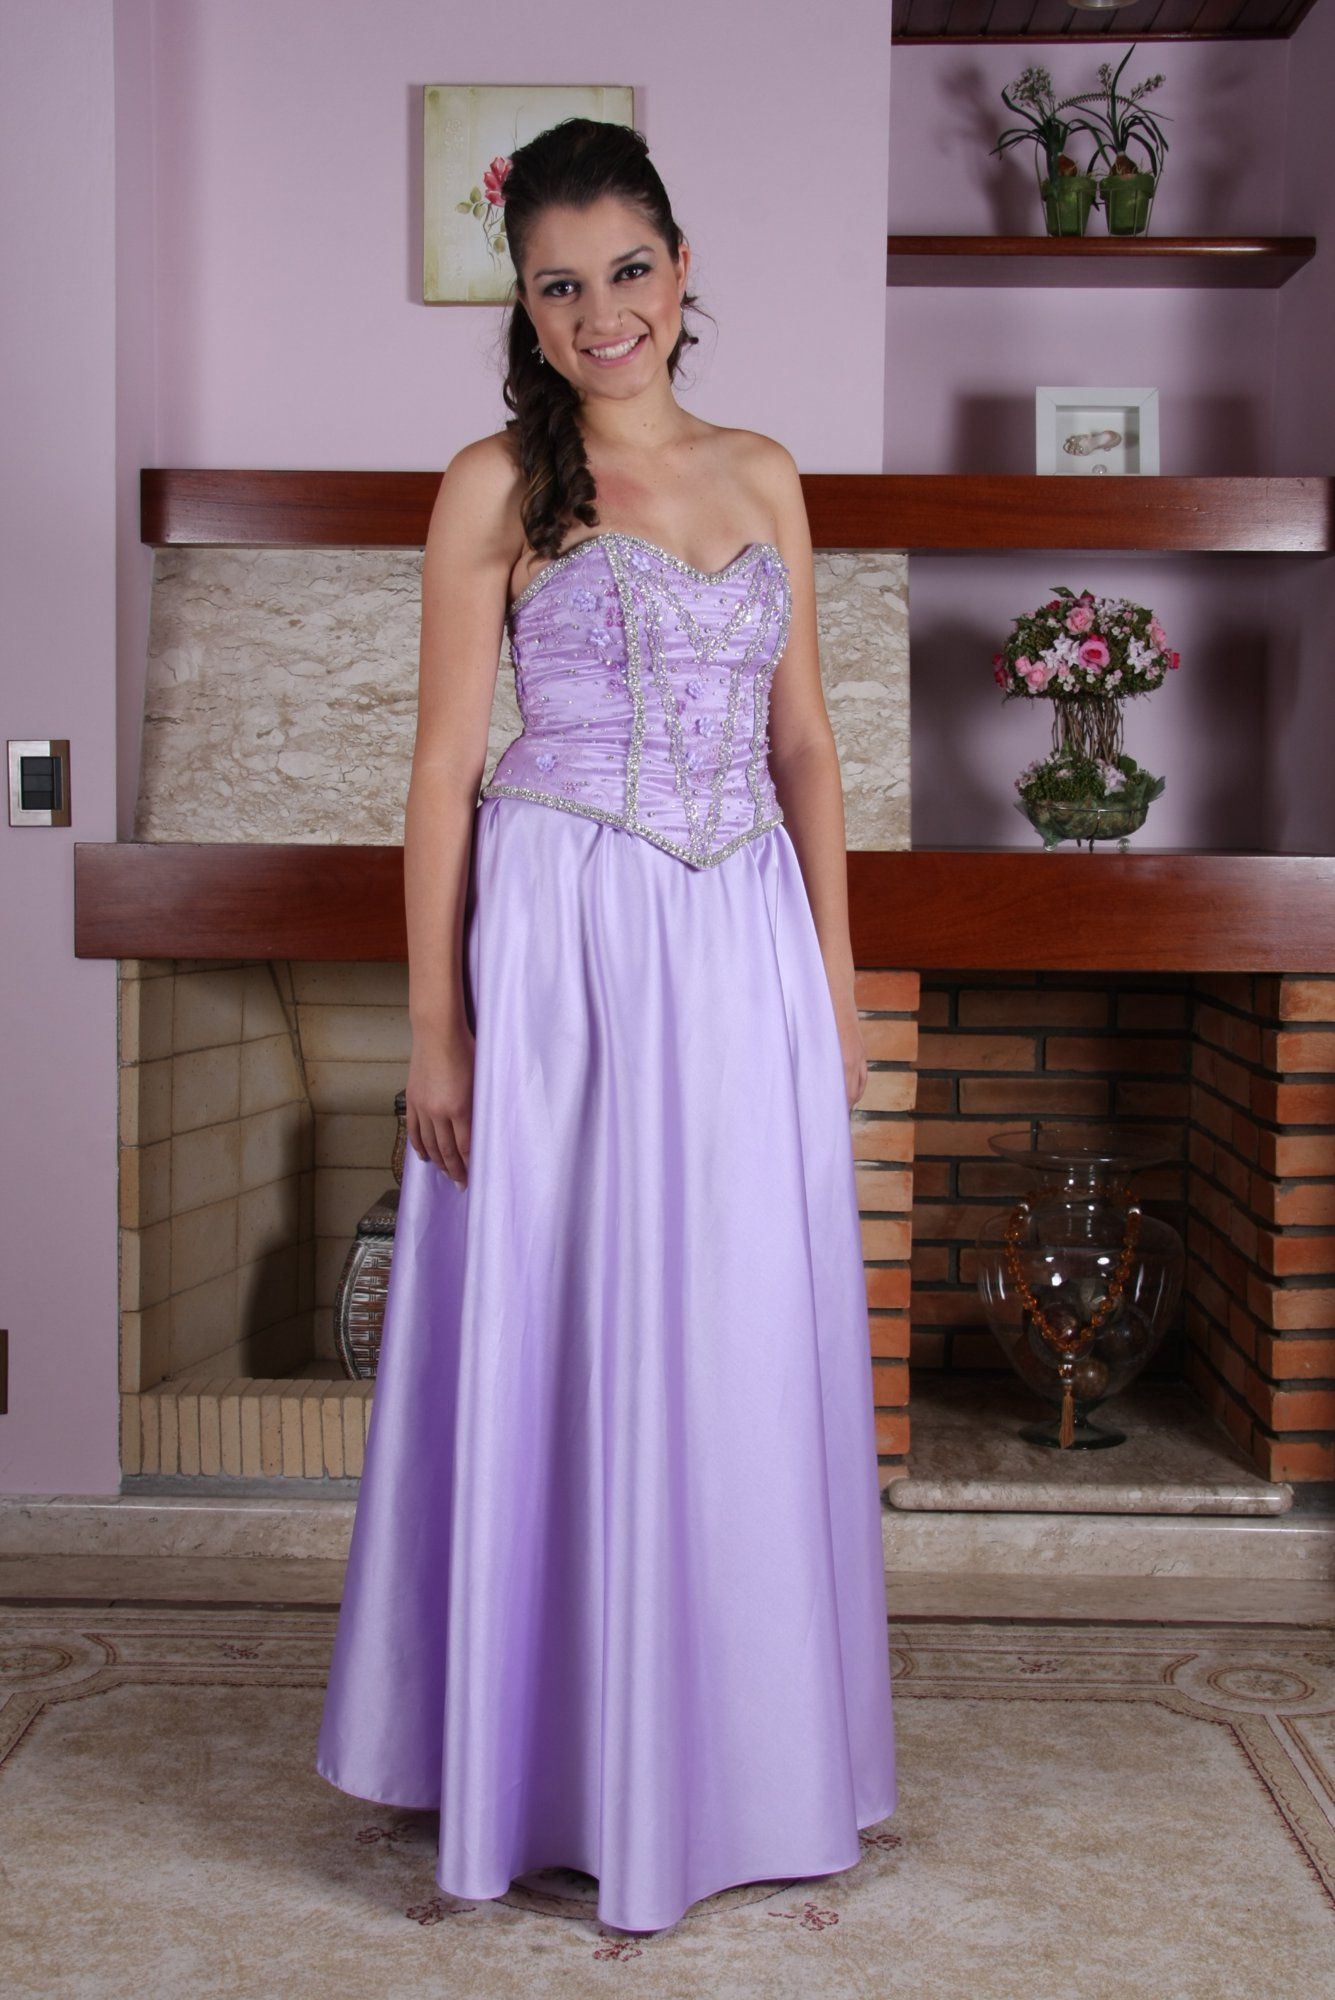 Vestido de Debutante Lilas - 10 - Hipnose Alta Costura e Spa para Noivas e Noivos - Campinas - SP Vestido de Debutante, Vestido de Debutante Lilas, Hipnose Alta Costura